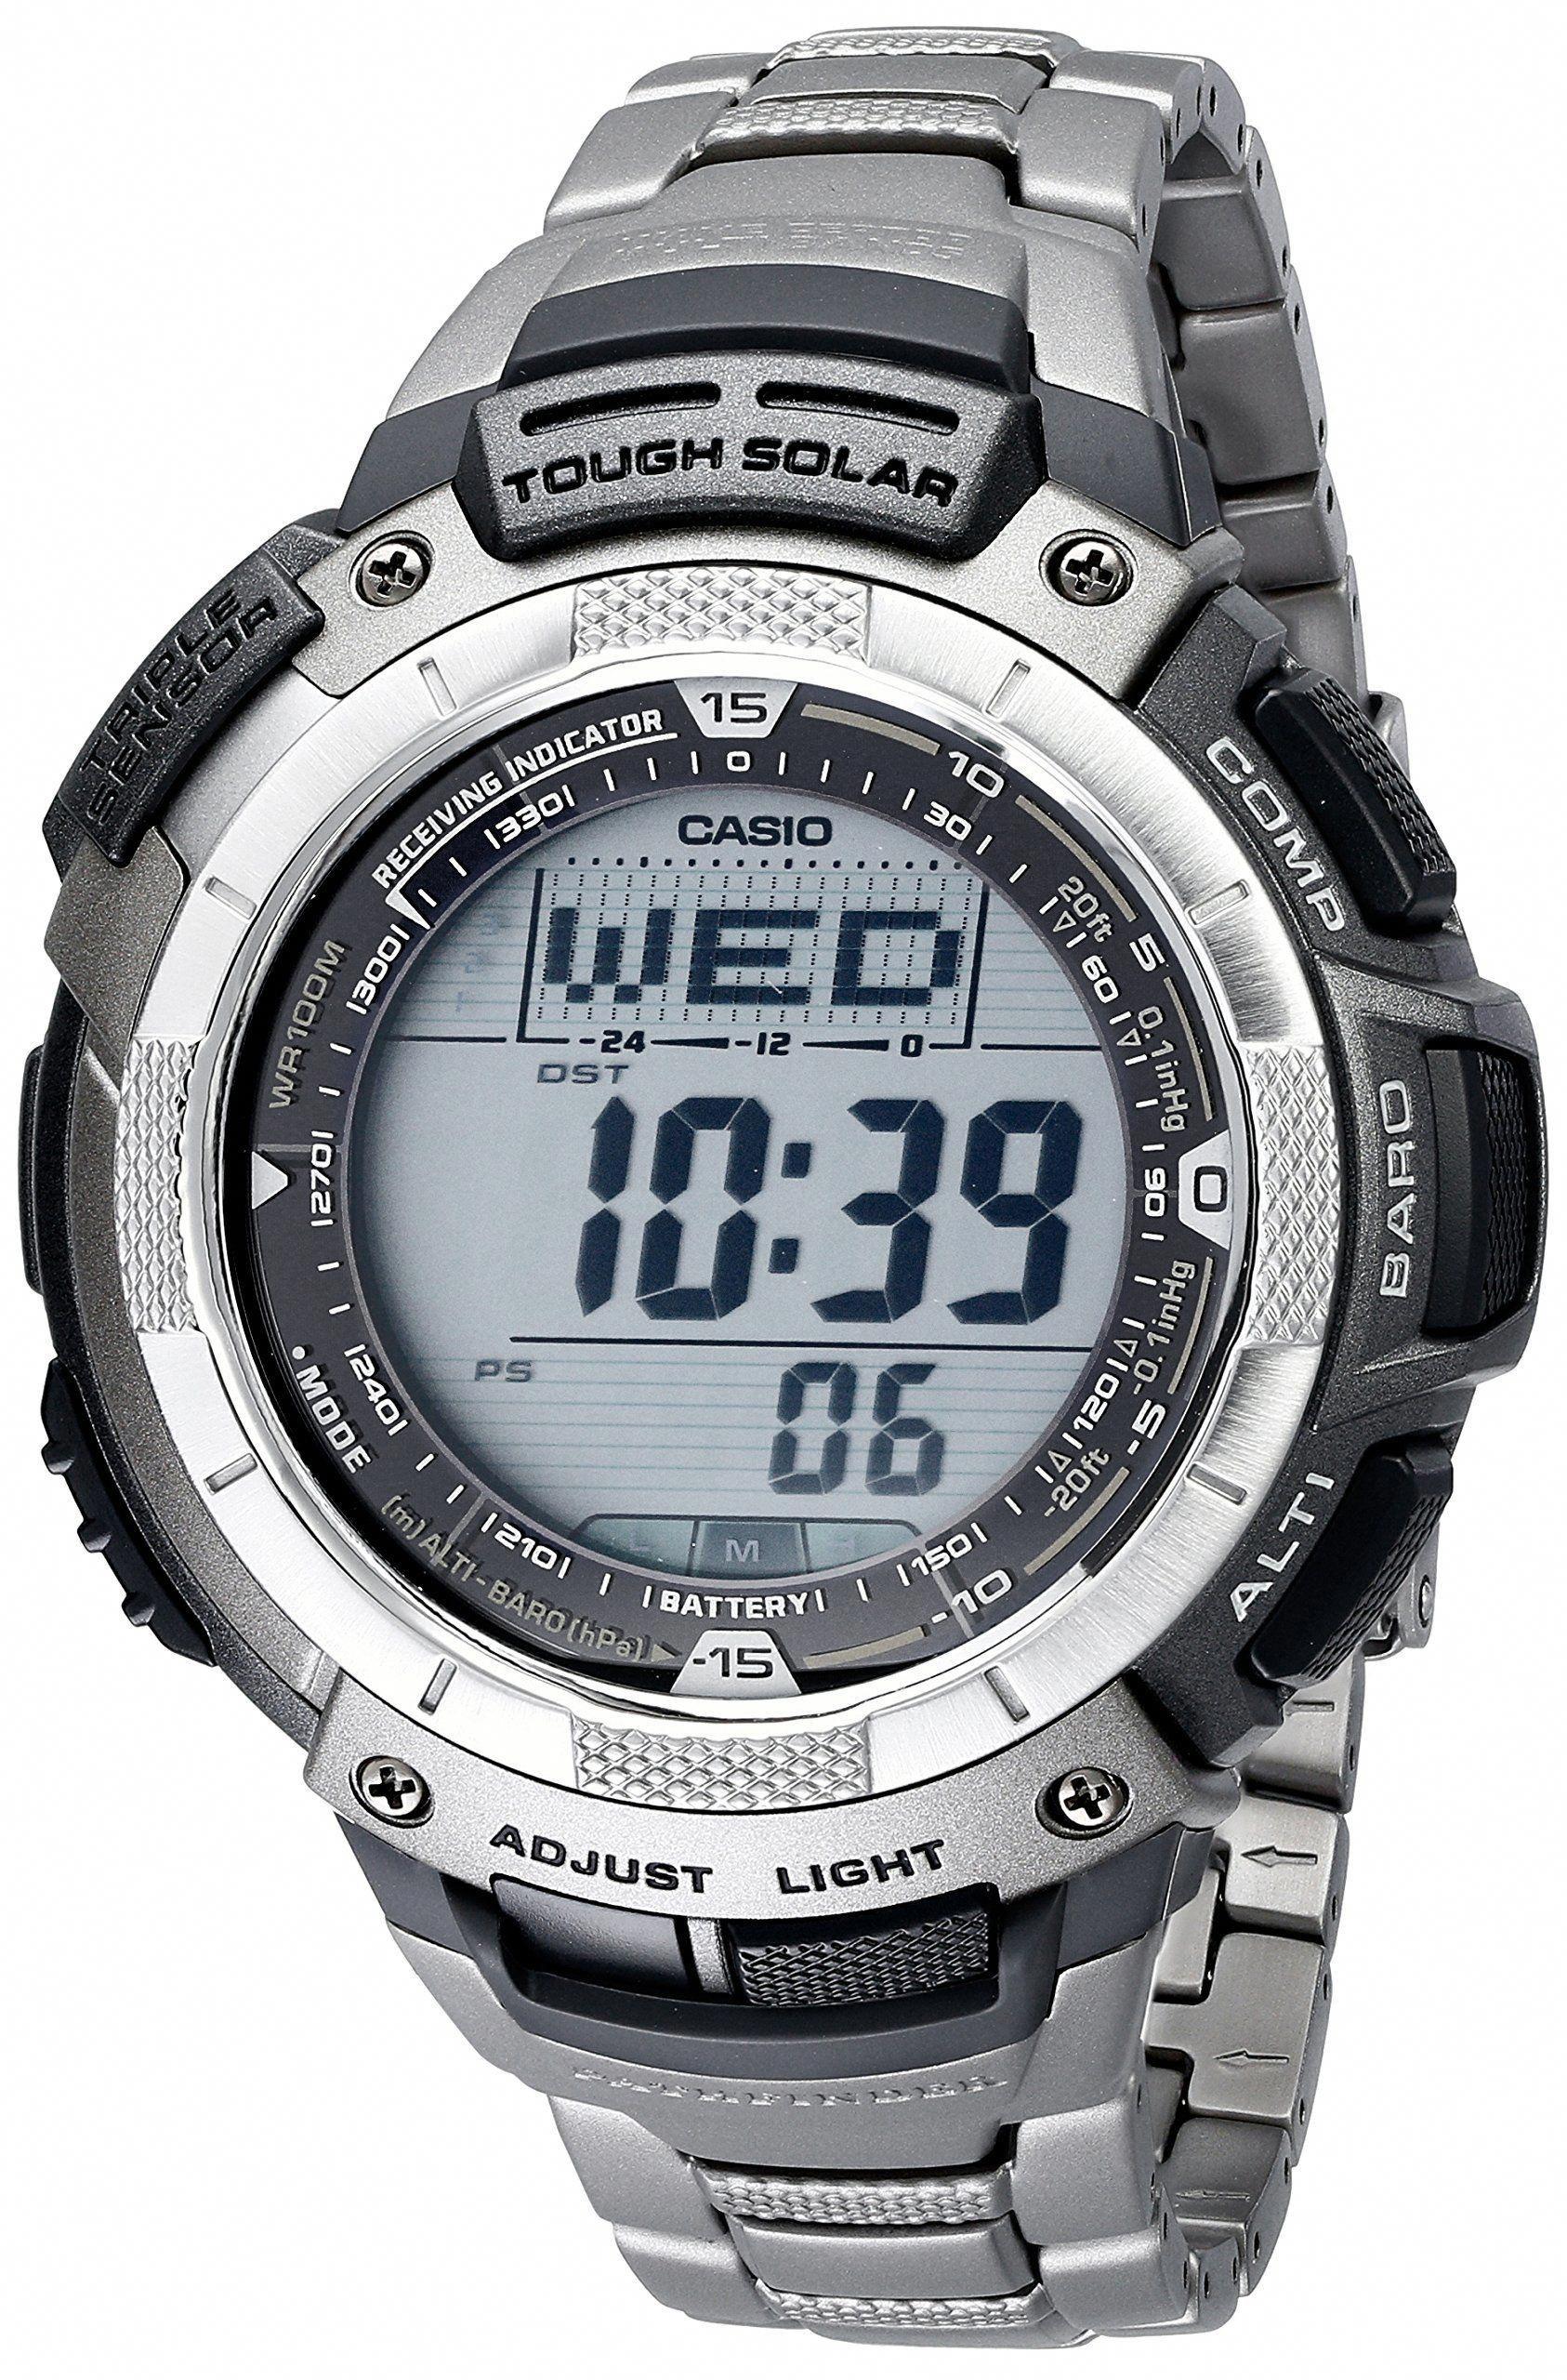 Casio PAW1100T-7V Pathfinder Altimeter and Barometer Solar Atomic Digital  Watch for Men d6ca641df3e